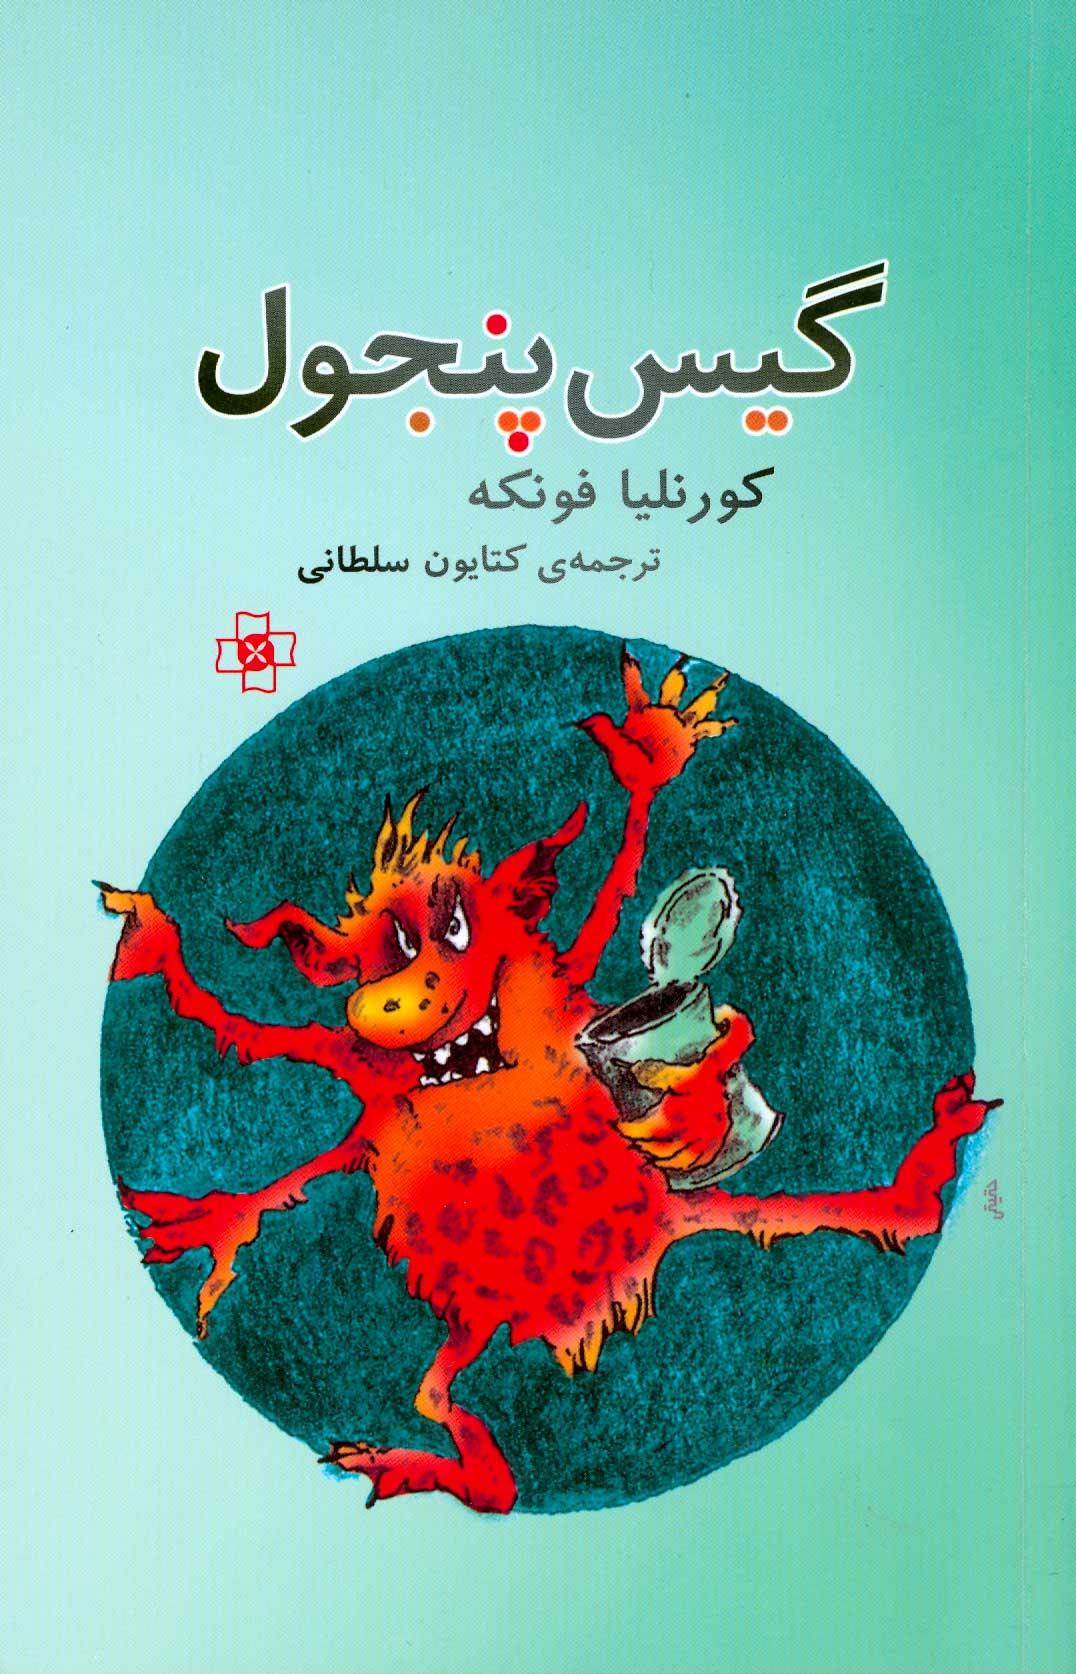 کتاب کودک و نوجوان: گیس پنجول دیو زمینی